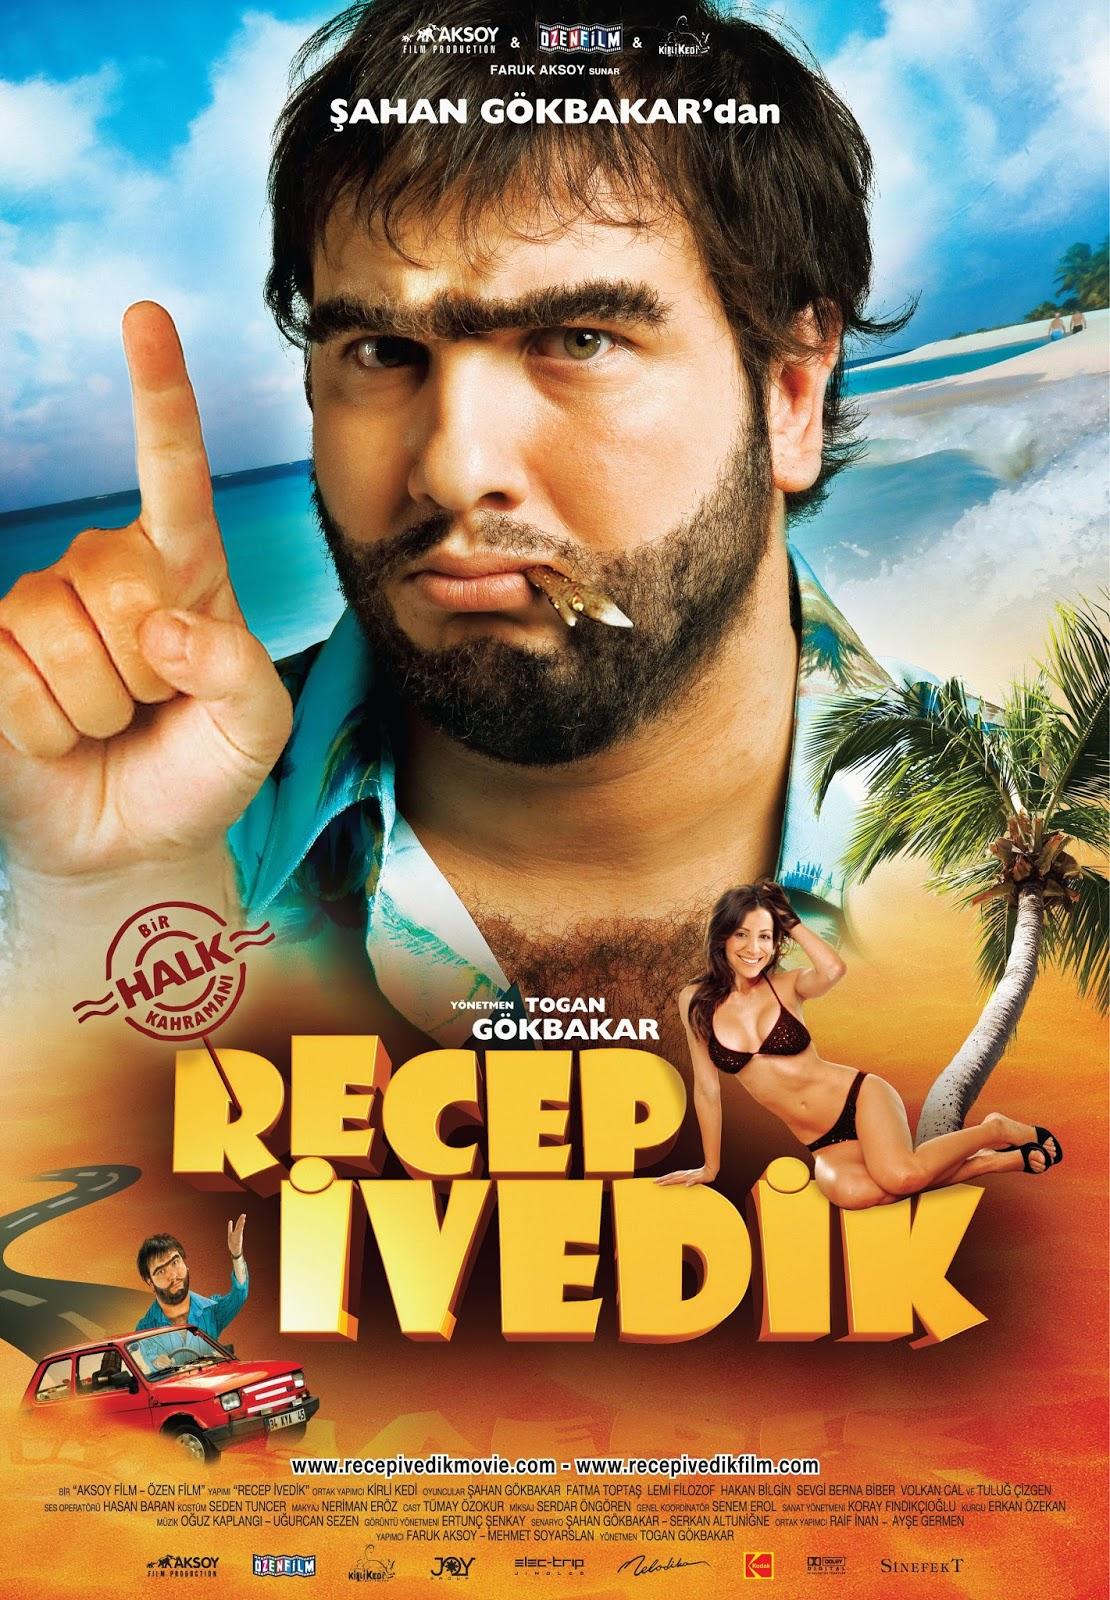 Recep Ivedik 3 Full Izle